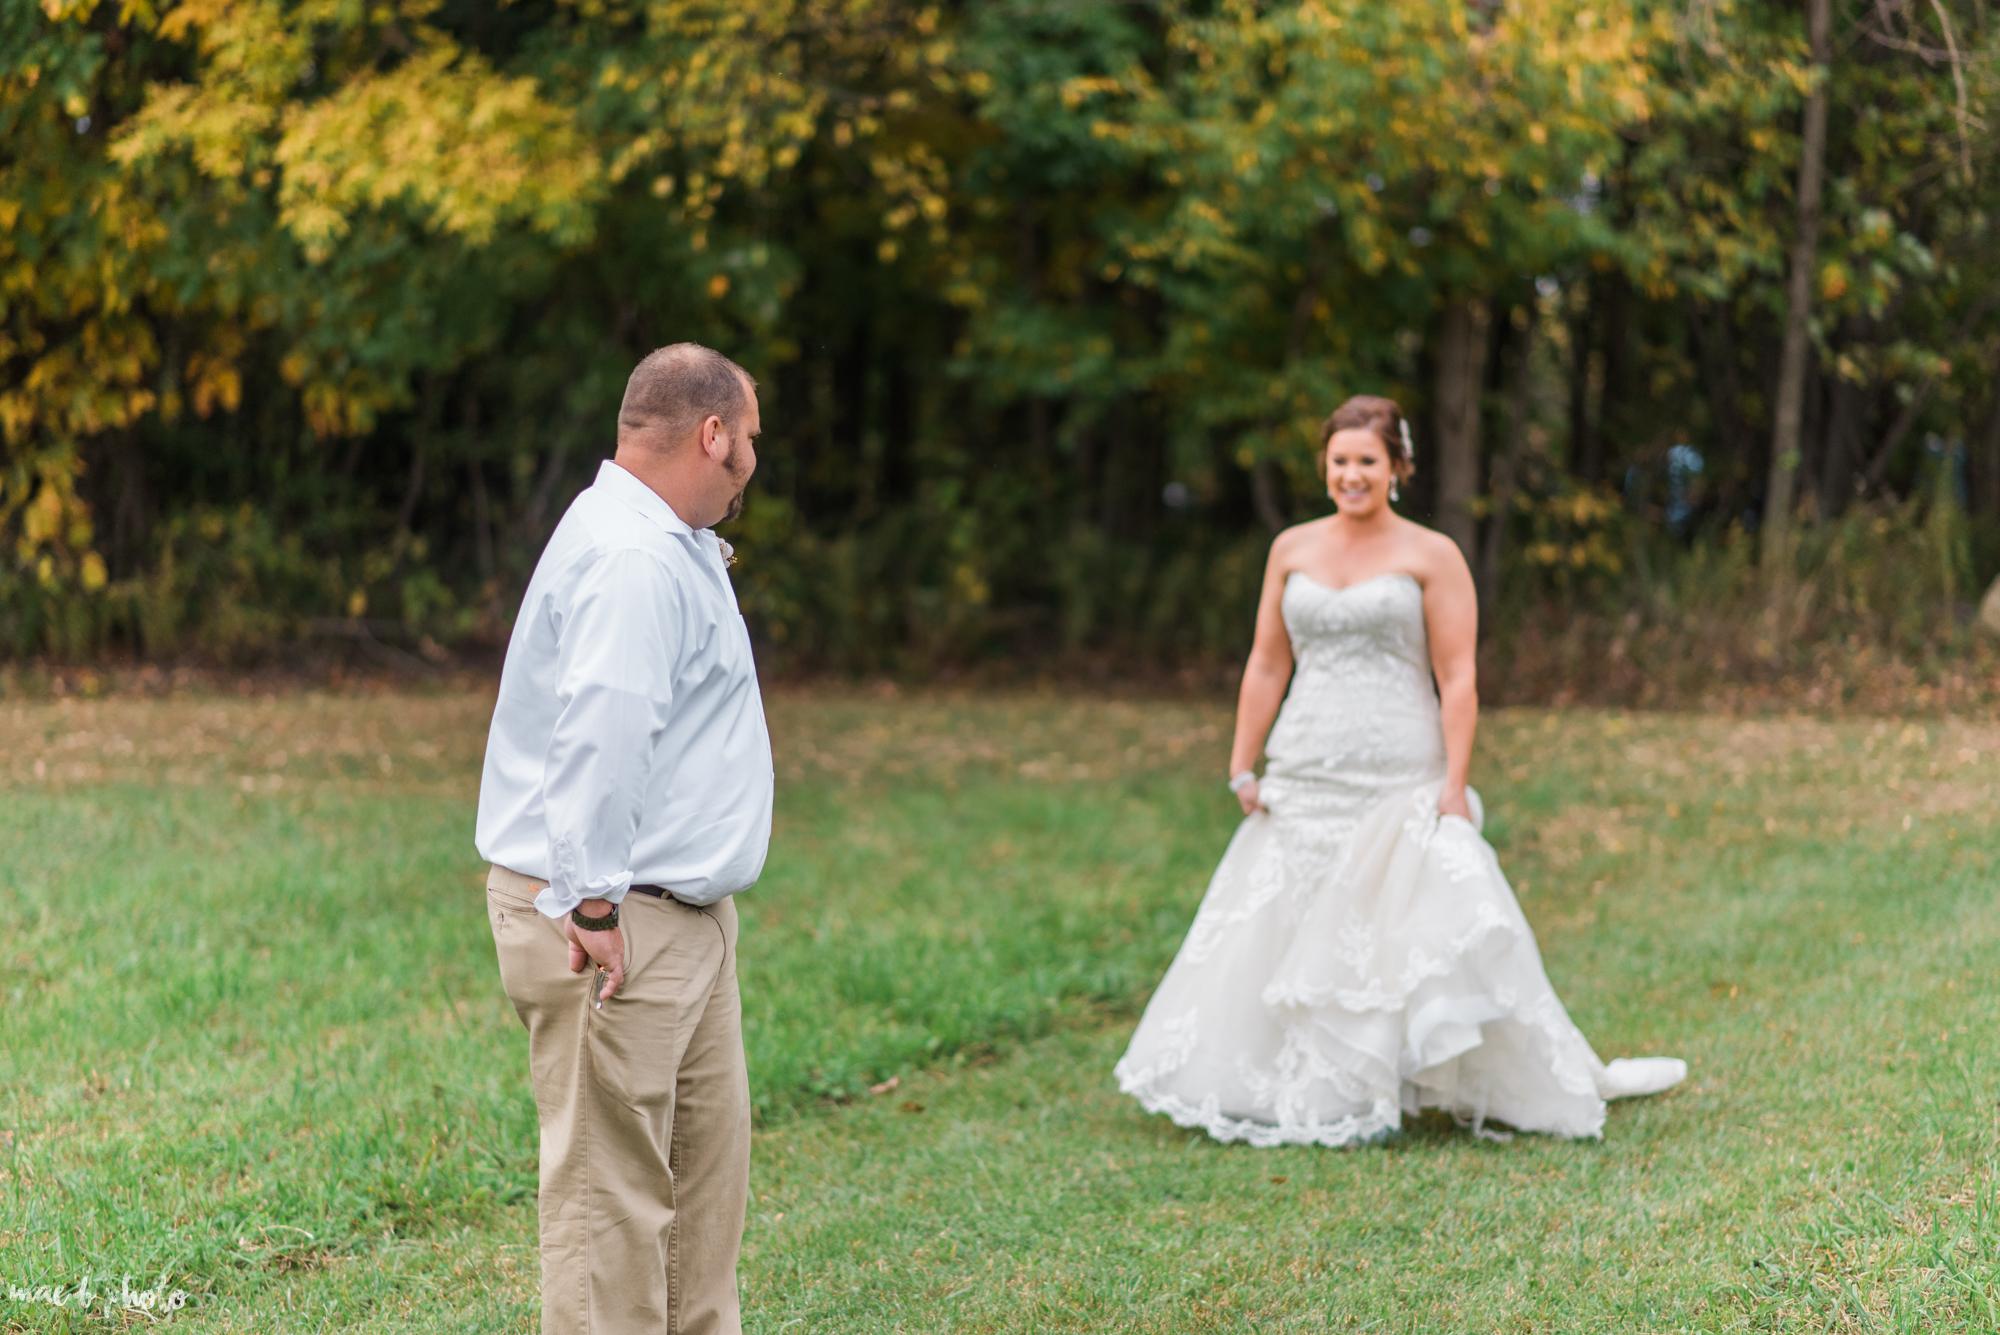 Sarah & Dustin's Rustic Chic Barn Wedding at Hartford Hill Winery in Hartford, Ohio by Mae B Photo-59.jpg